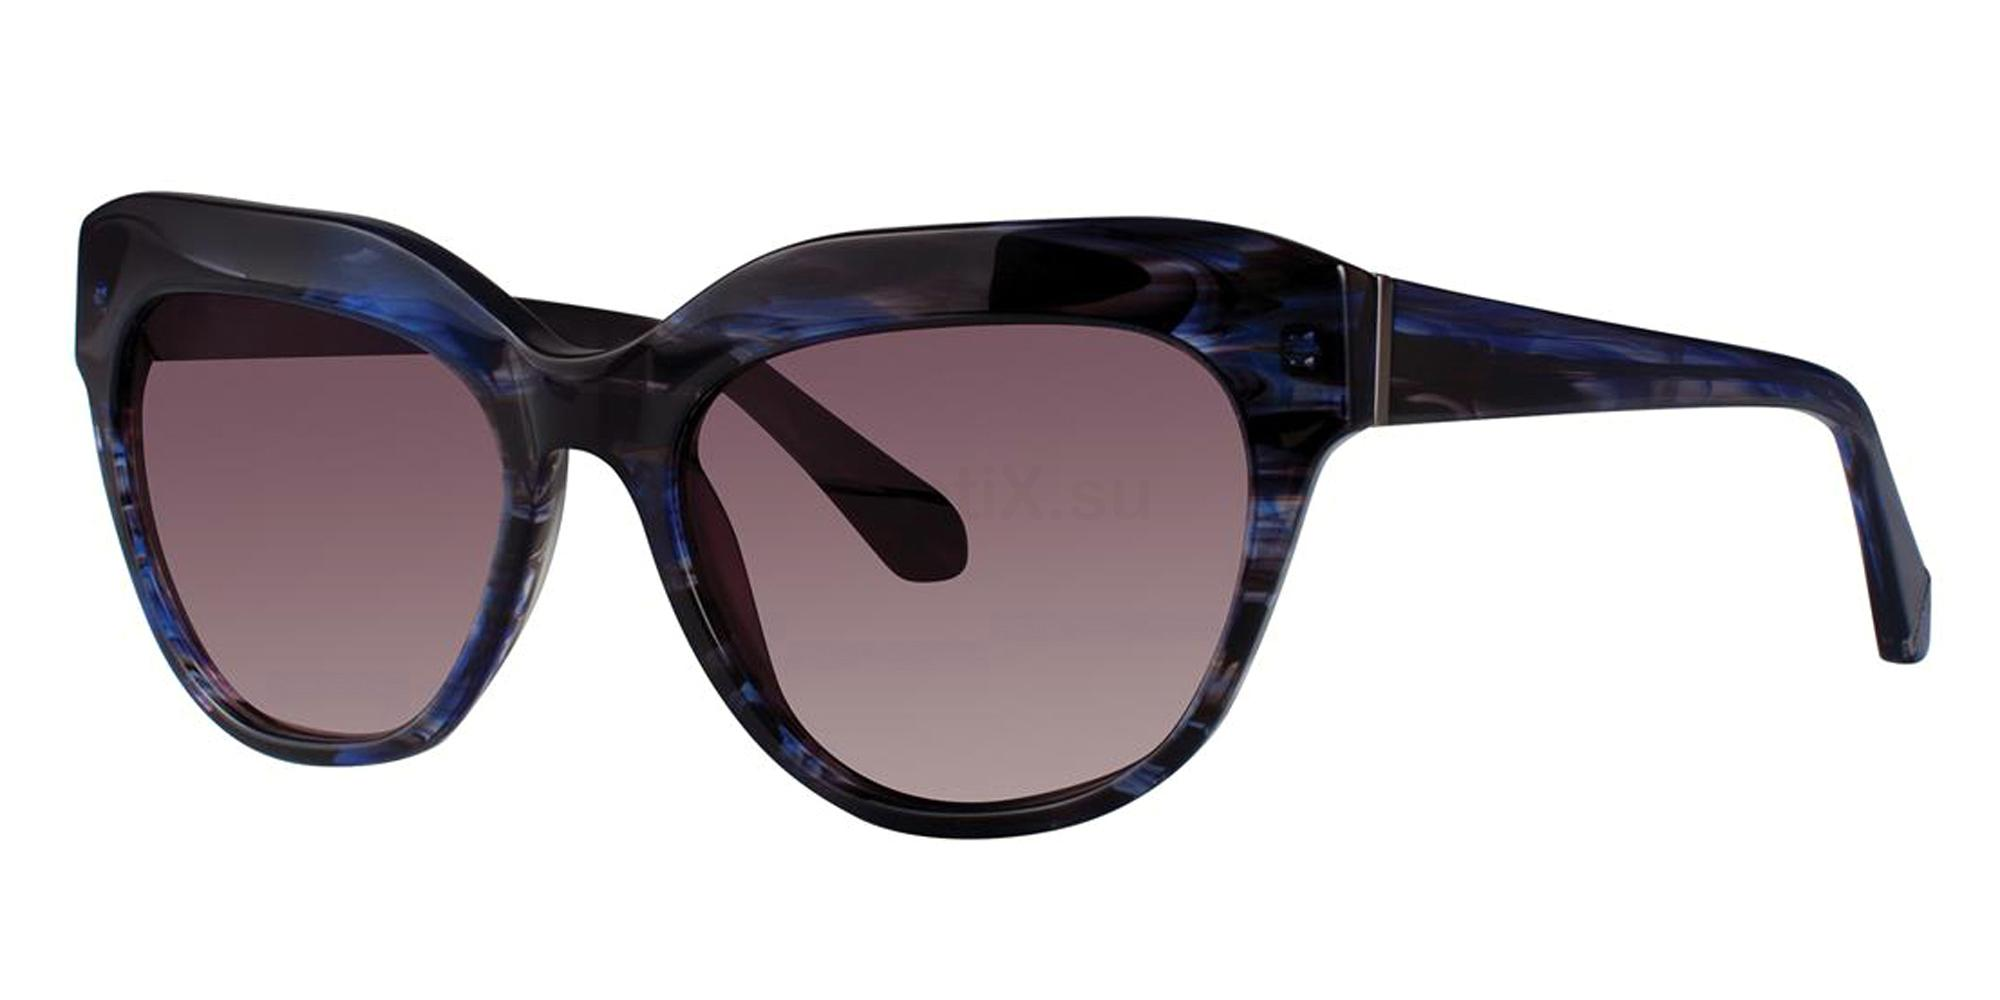 Blue Tortoise NOBLE Sunglasses, Zac Posen